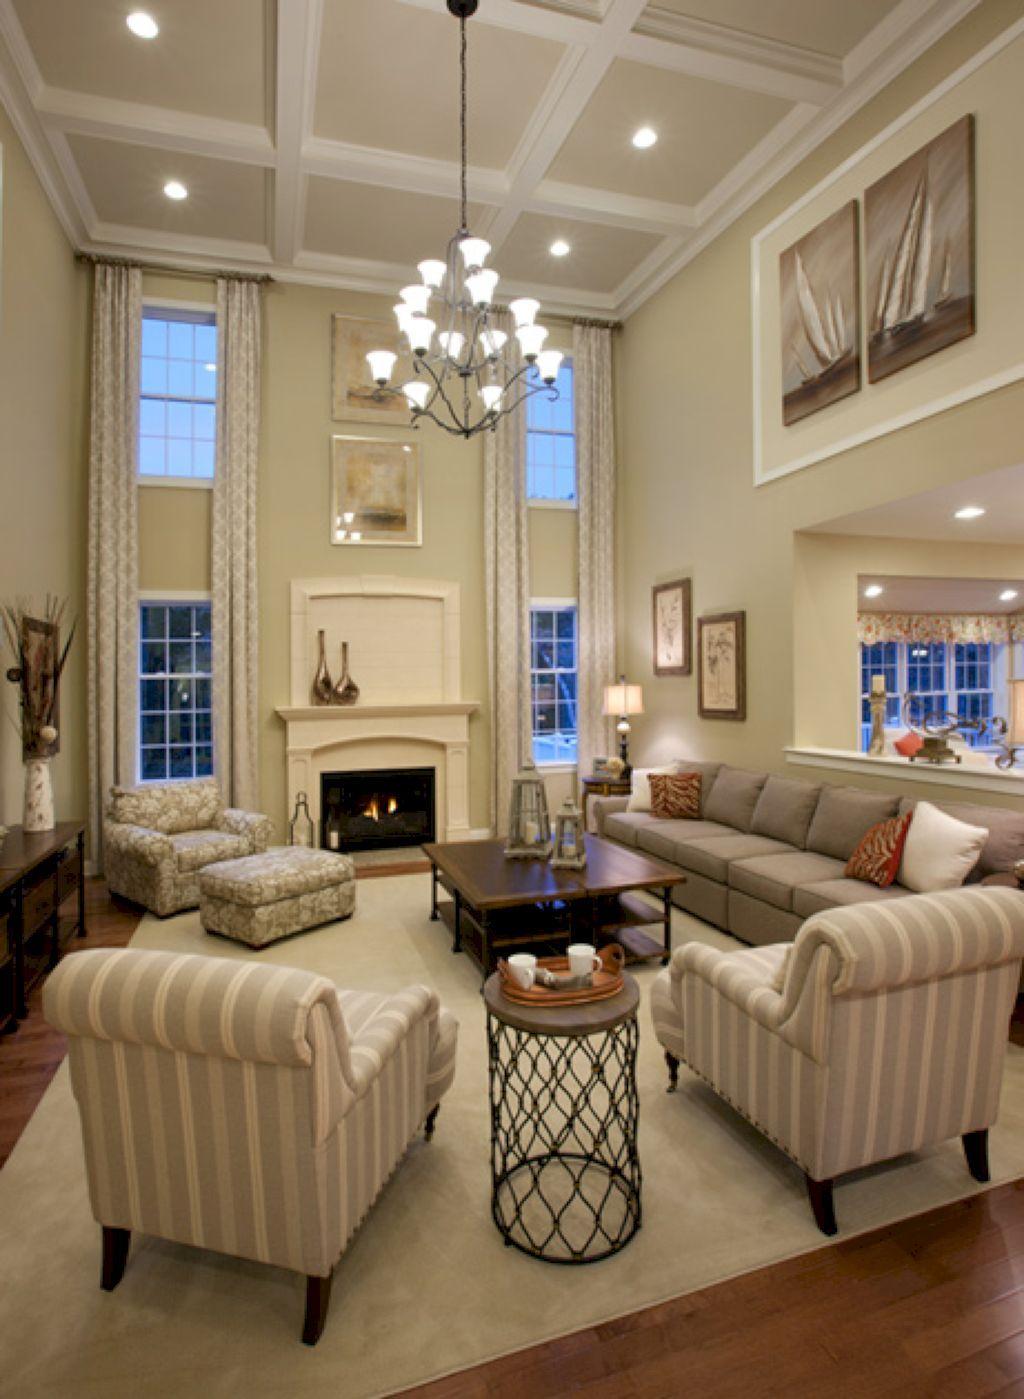 Adorable 35 Elegant Living Room Decor Ideas Https Belleza